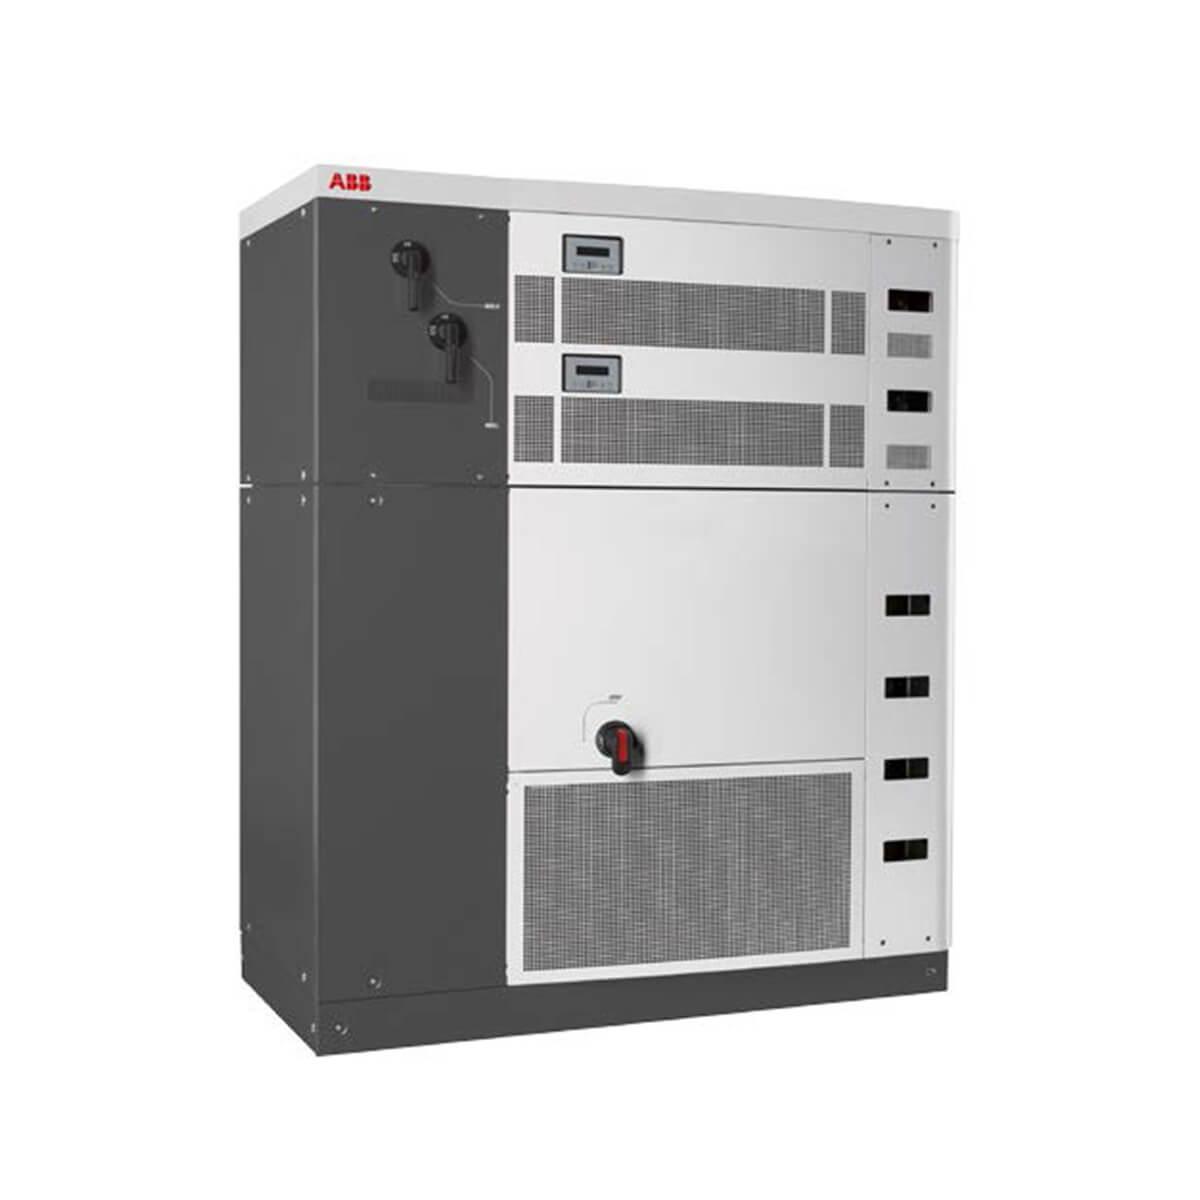 abb fimer 110kW inverter, abb fimer pvi 110kW inverter, abb fimer pvi-110-tl inverter, abb fimer pvi-110-tl, abb fimer pvi 110 kW